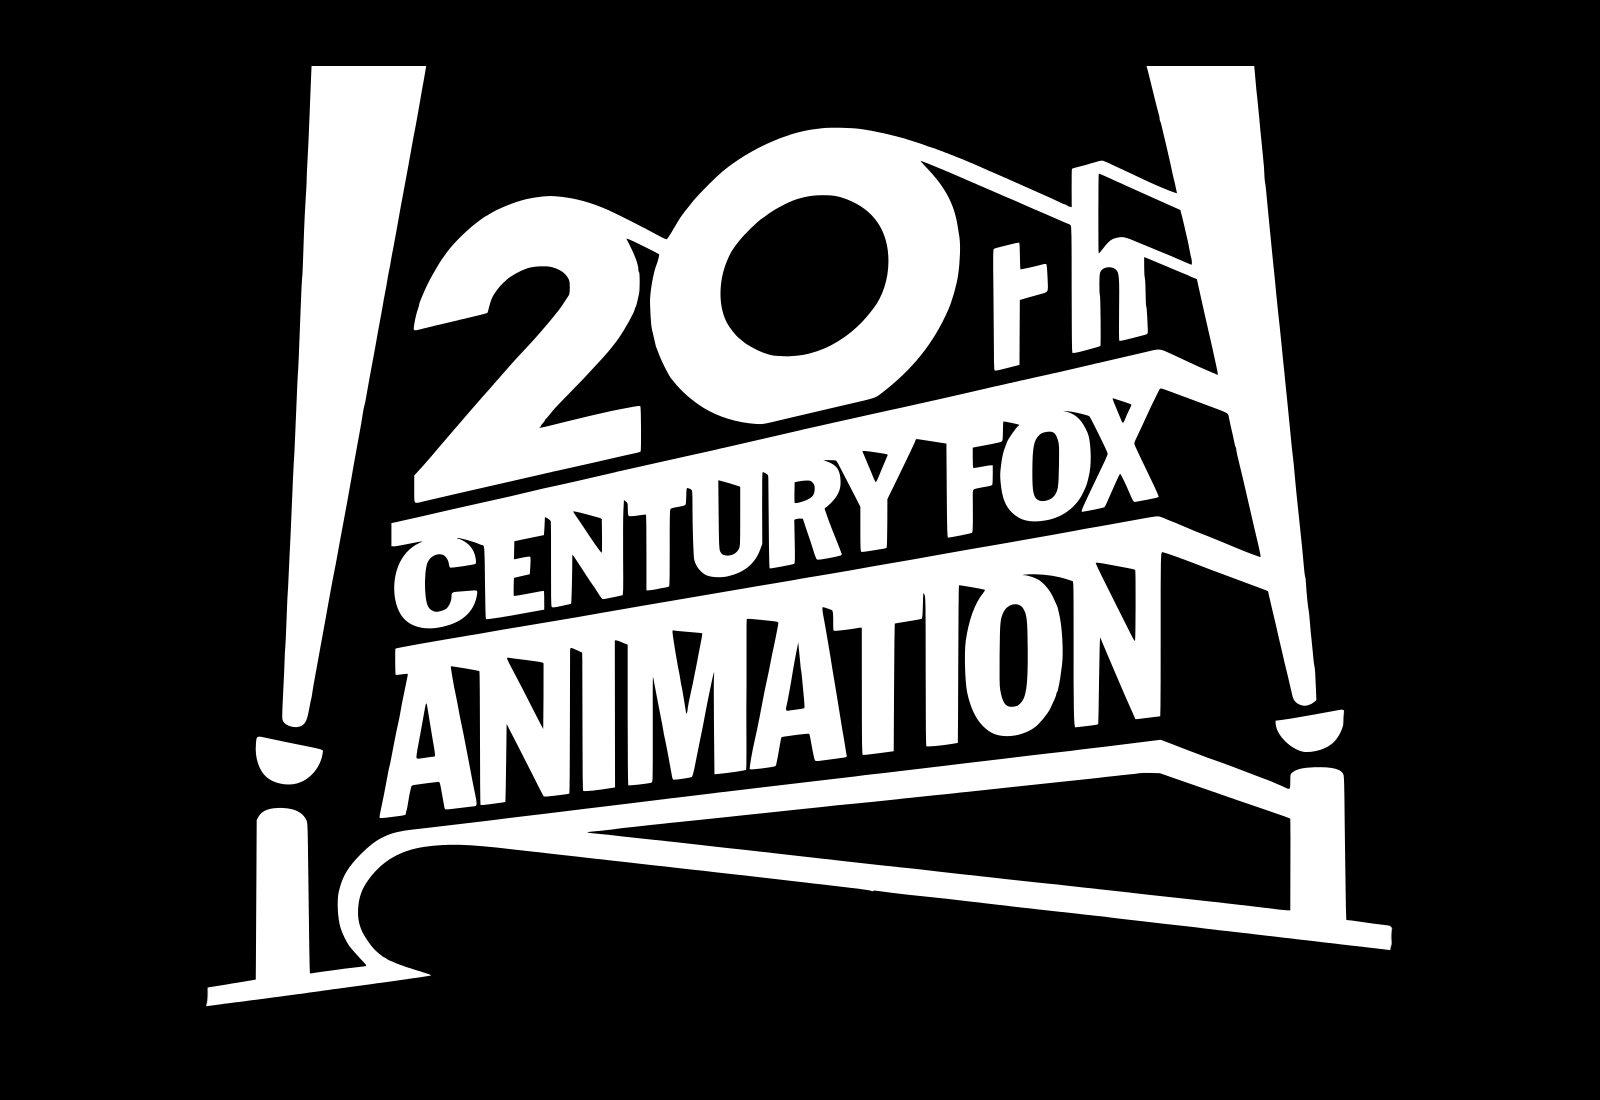 20th century fox logo 20th century fox logo symbol